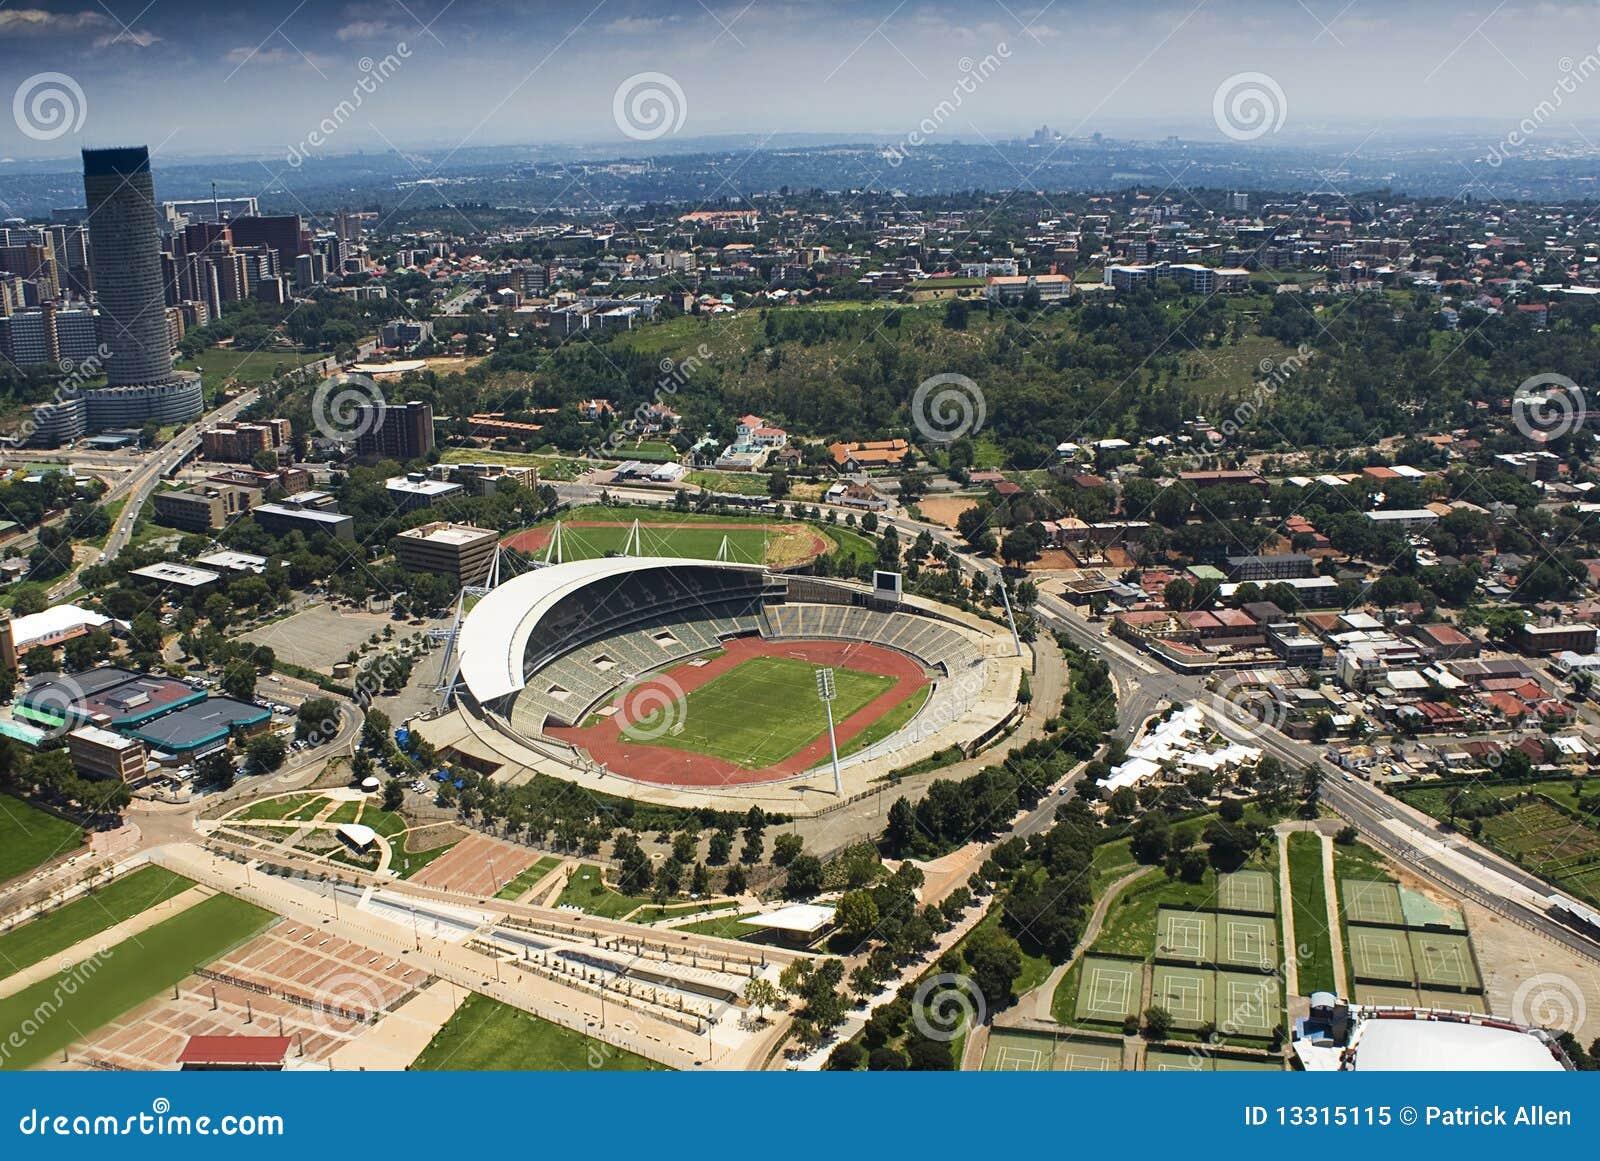 Stadio di Johannesburg - vista aerea